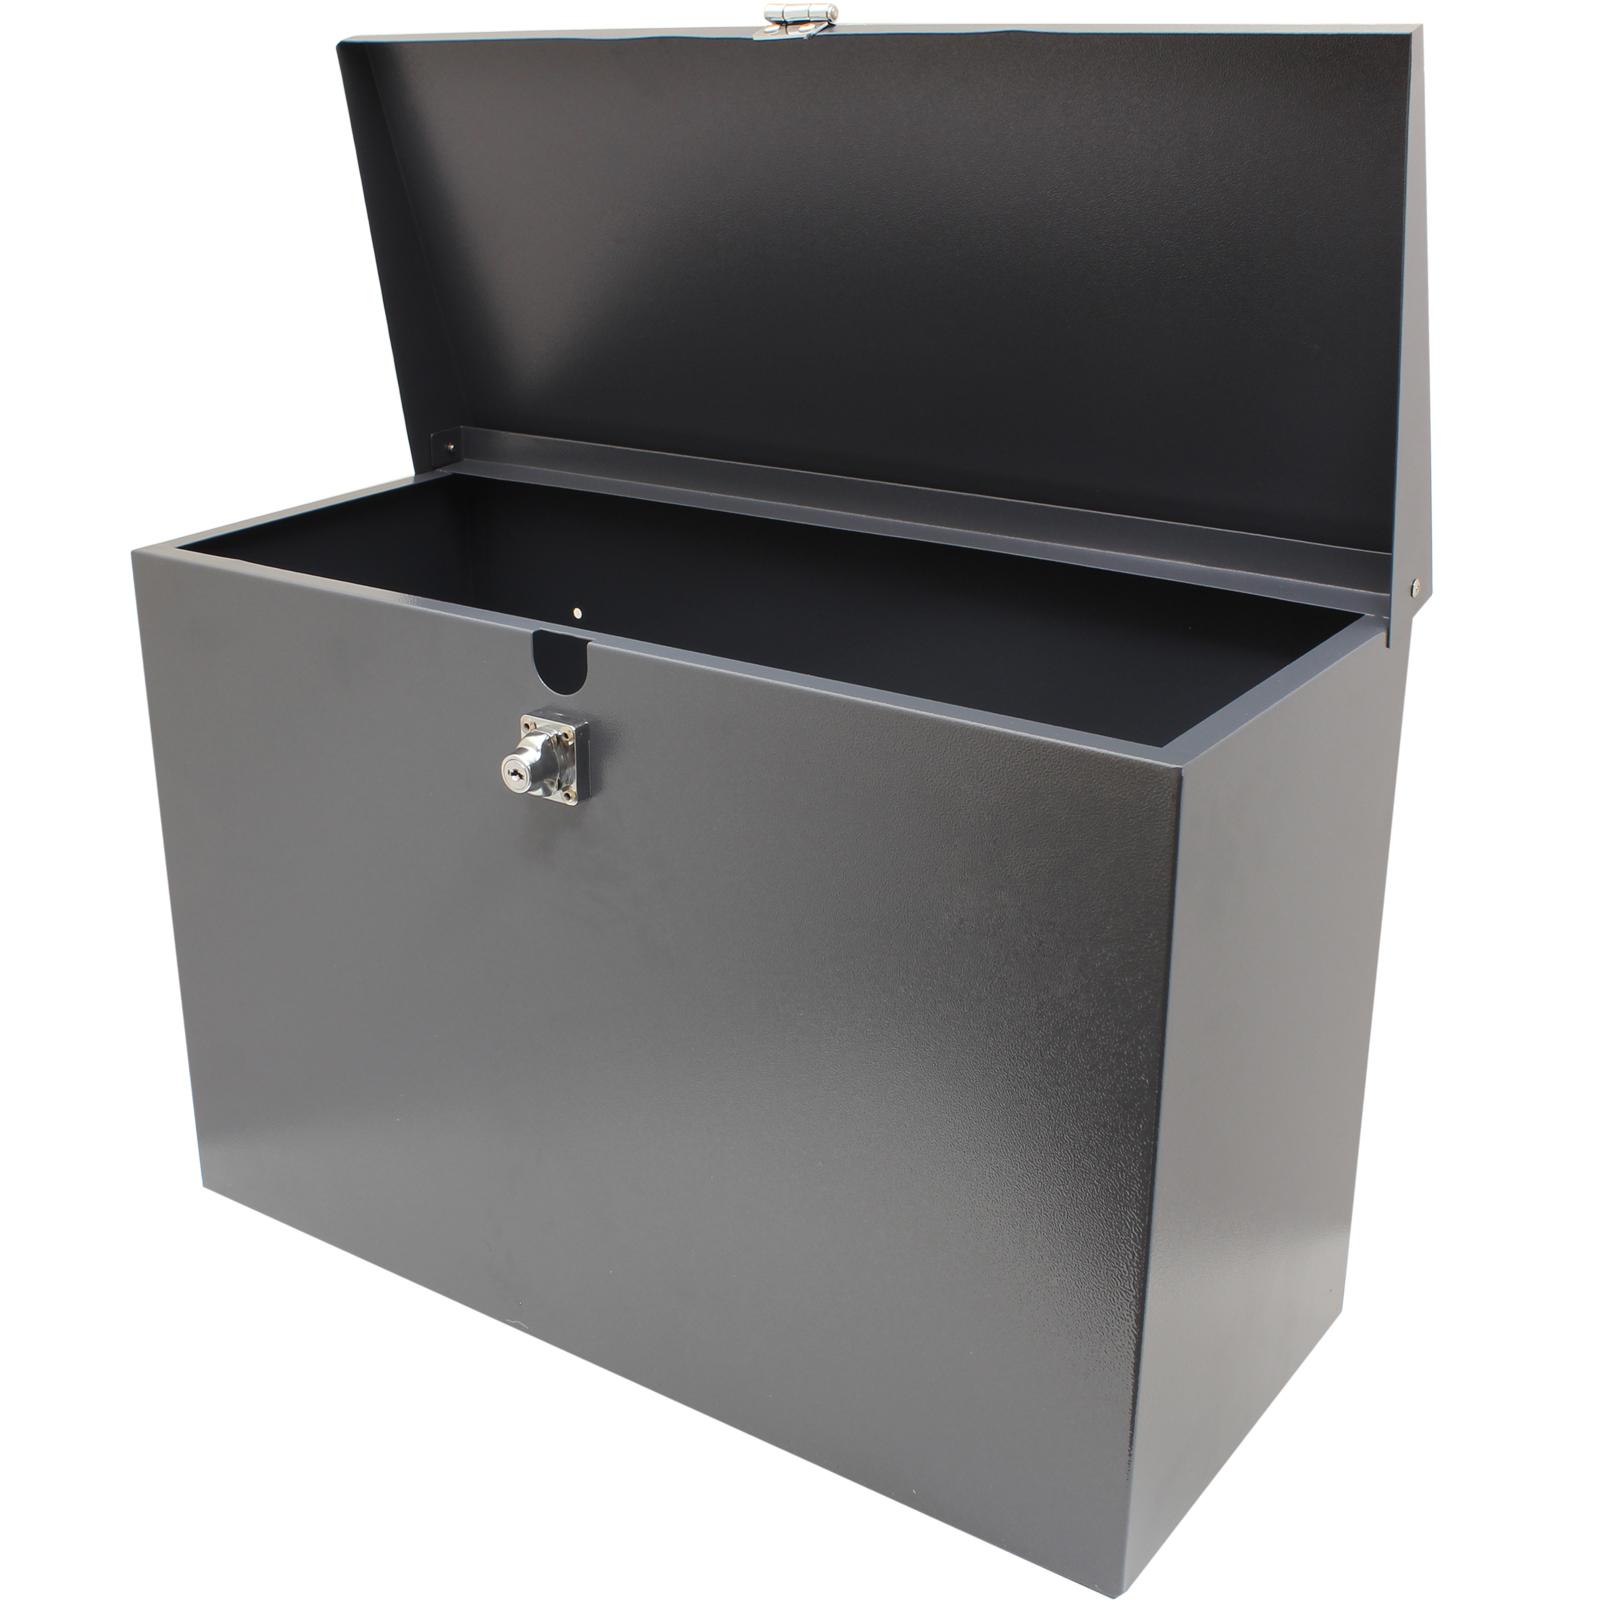 Letterbox Uk: HARDCASTLE LARGE GREY LOCKABLE LETTERBOX/PARCEL BOX HOME